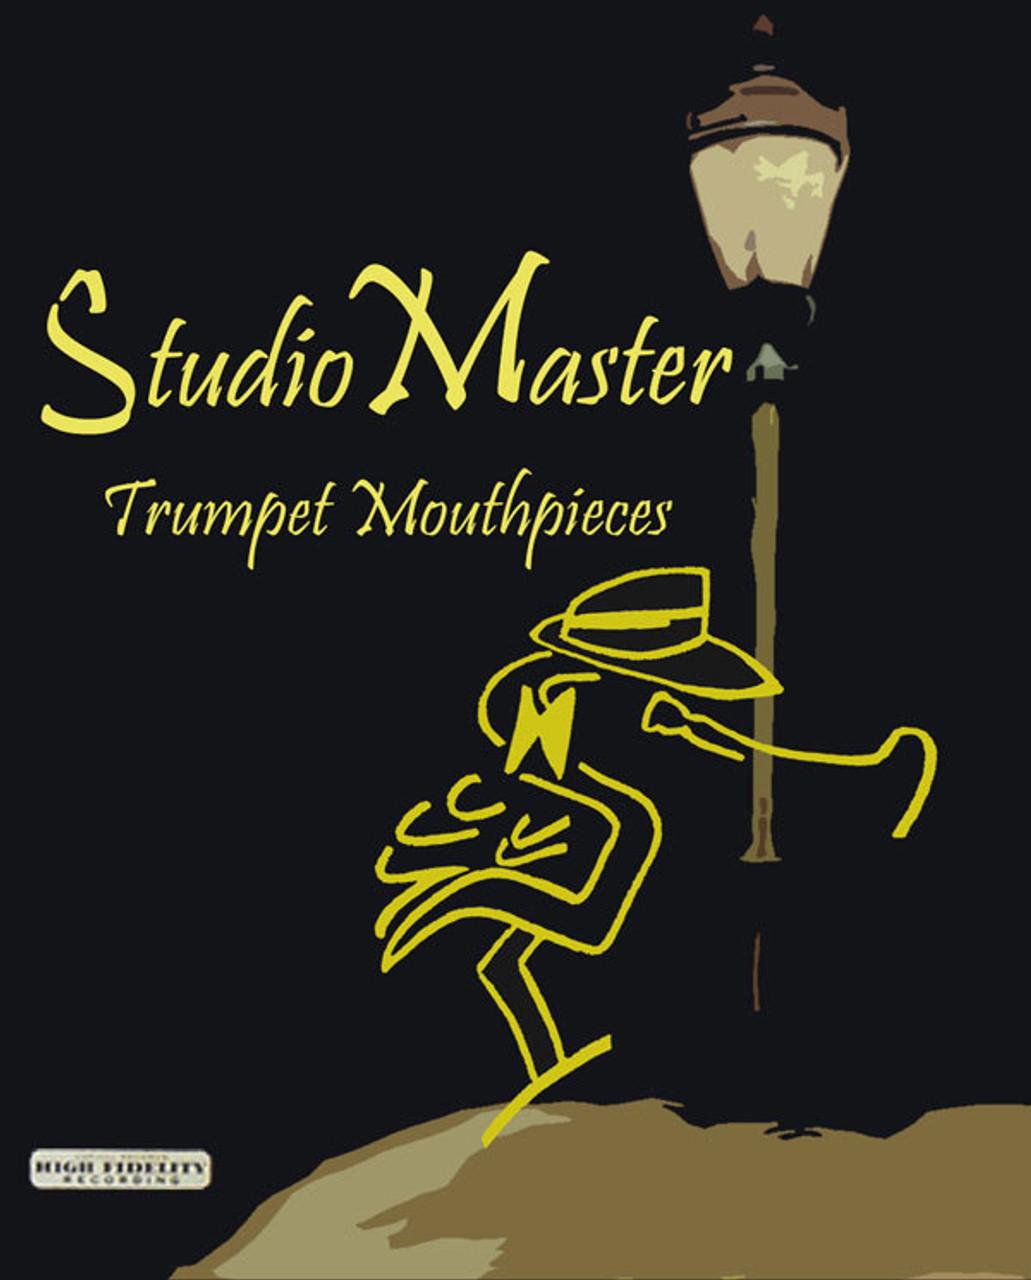 Studio Master